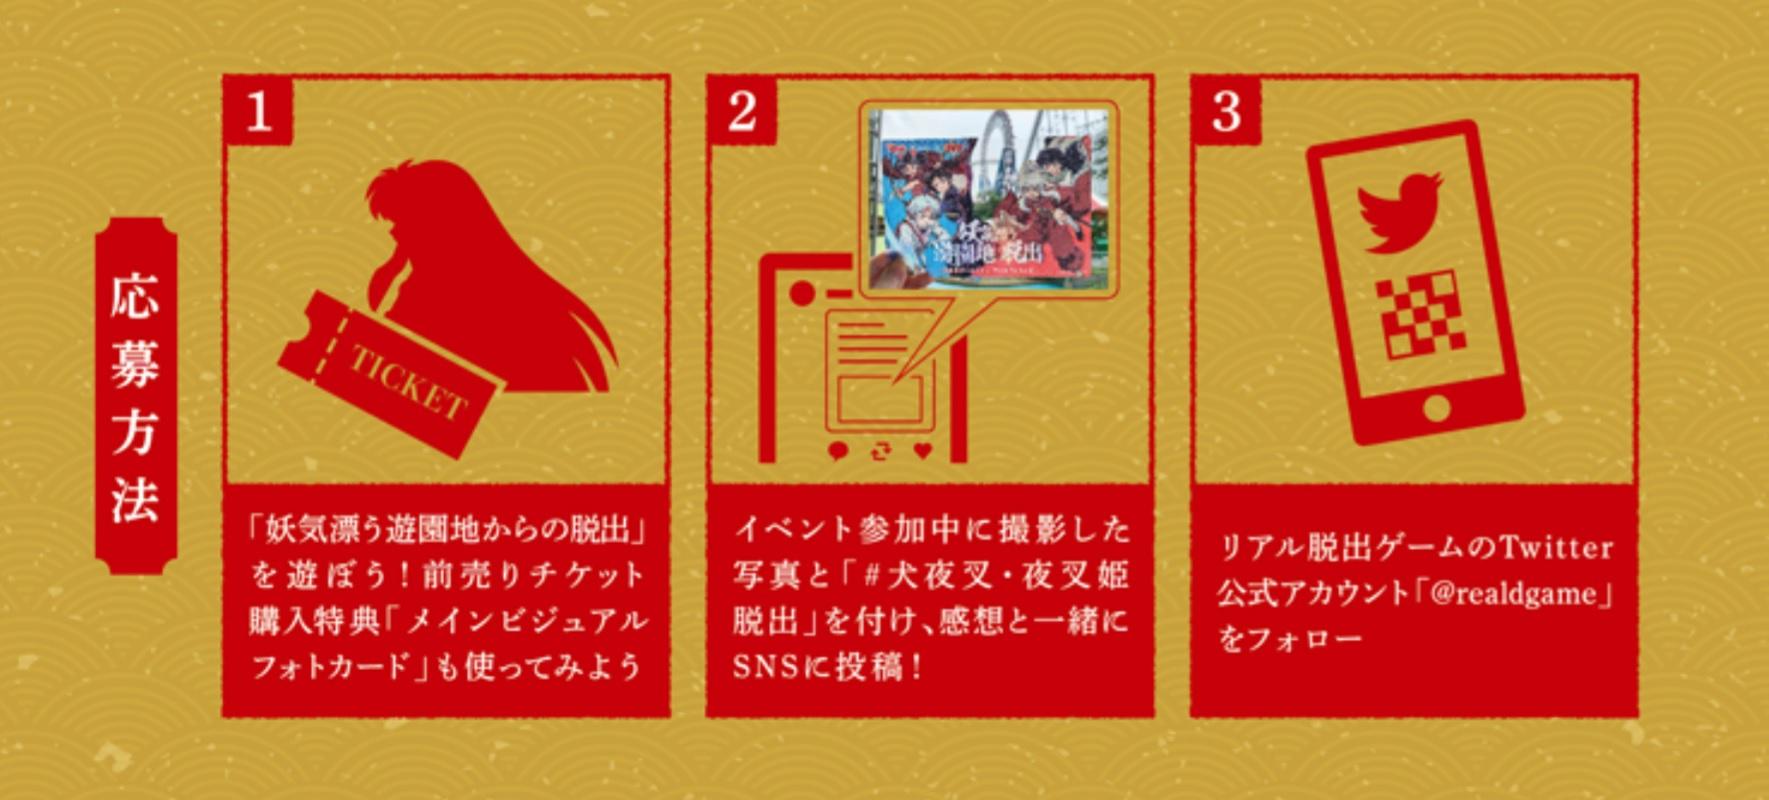 inuyashahime感想CP画像.jpg